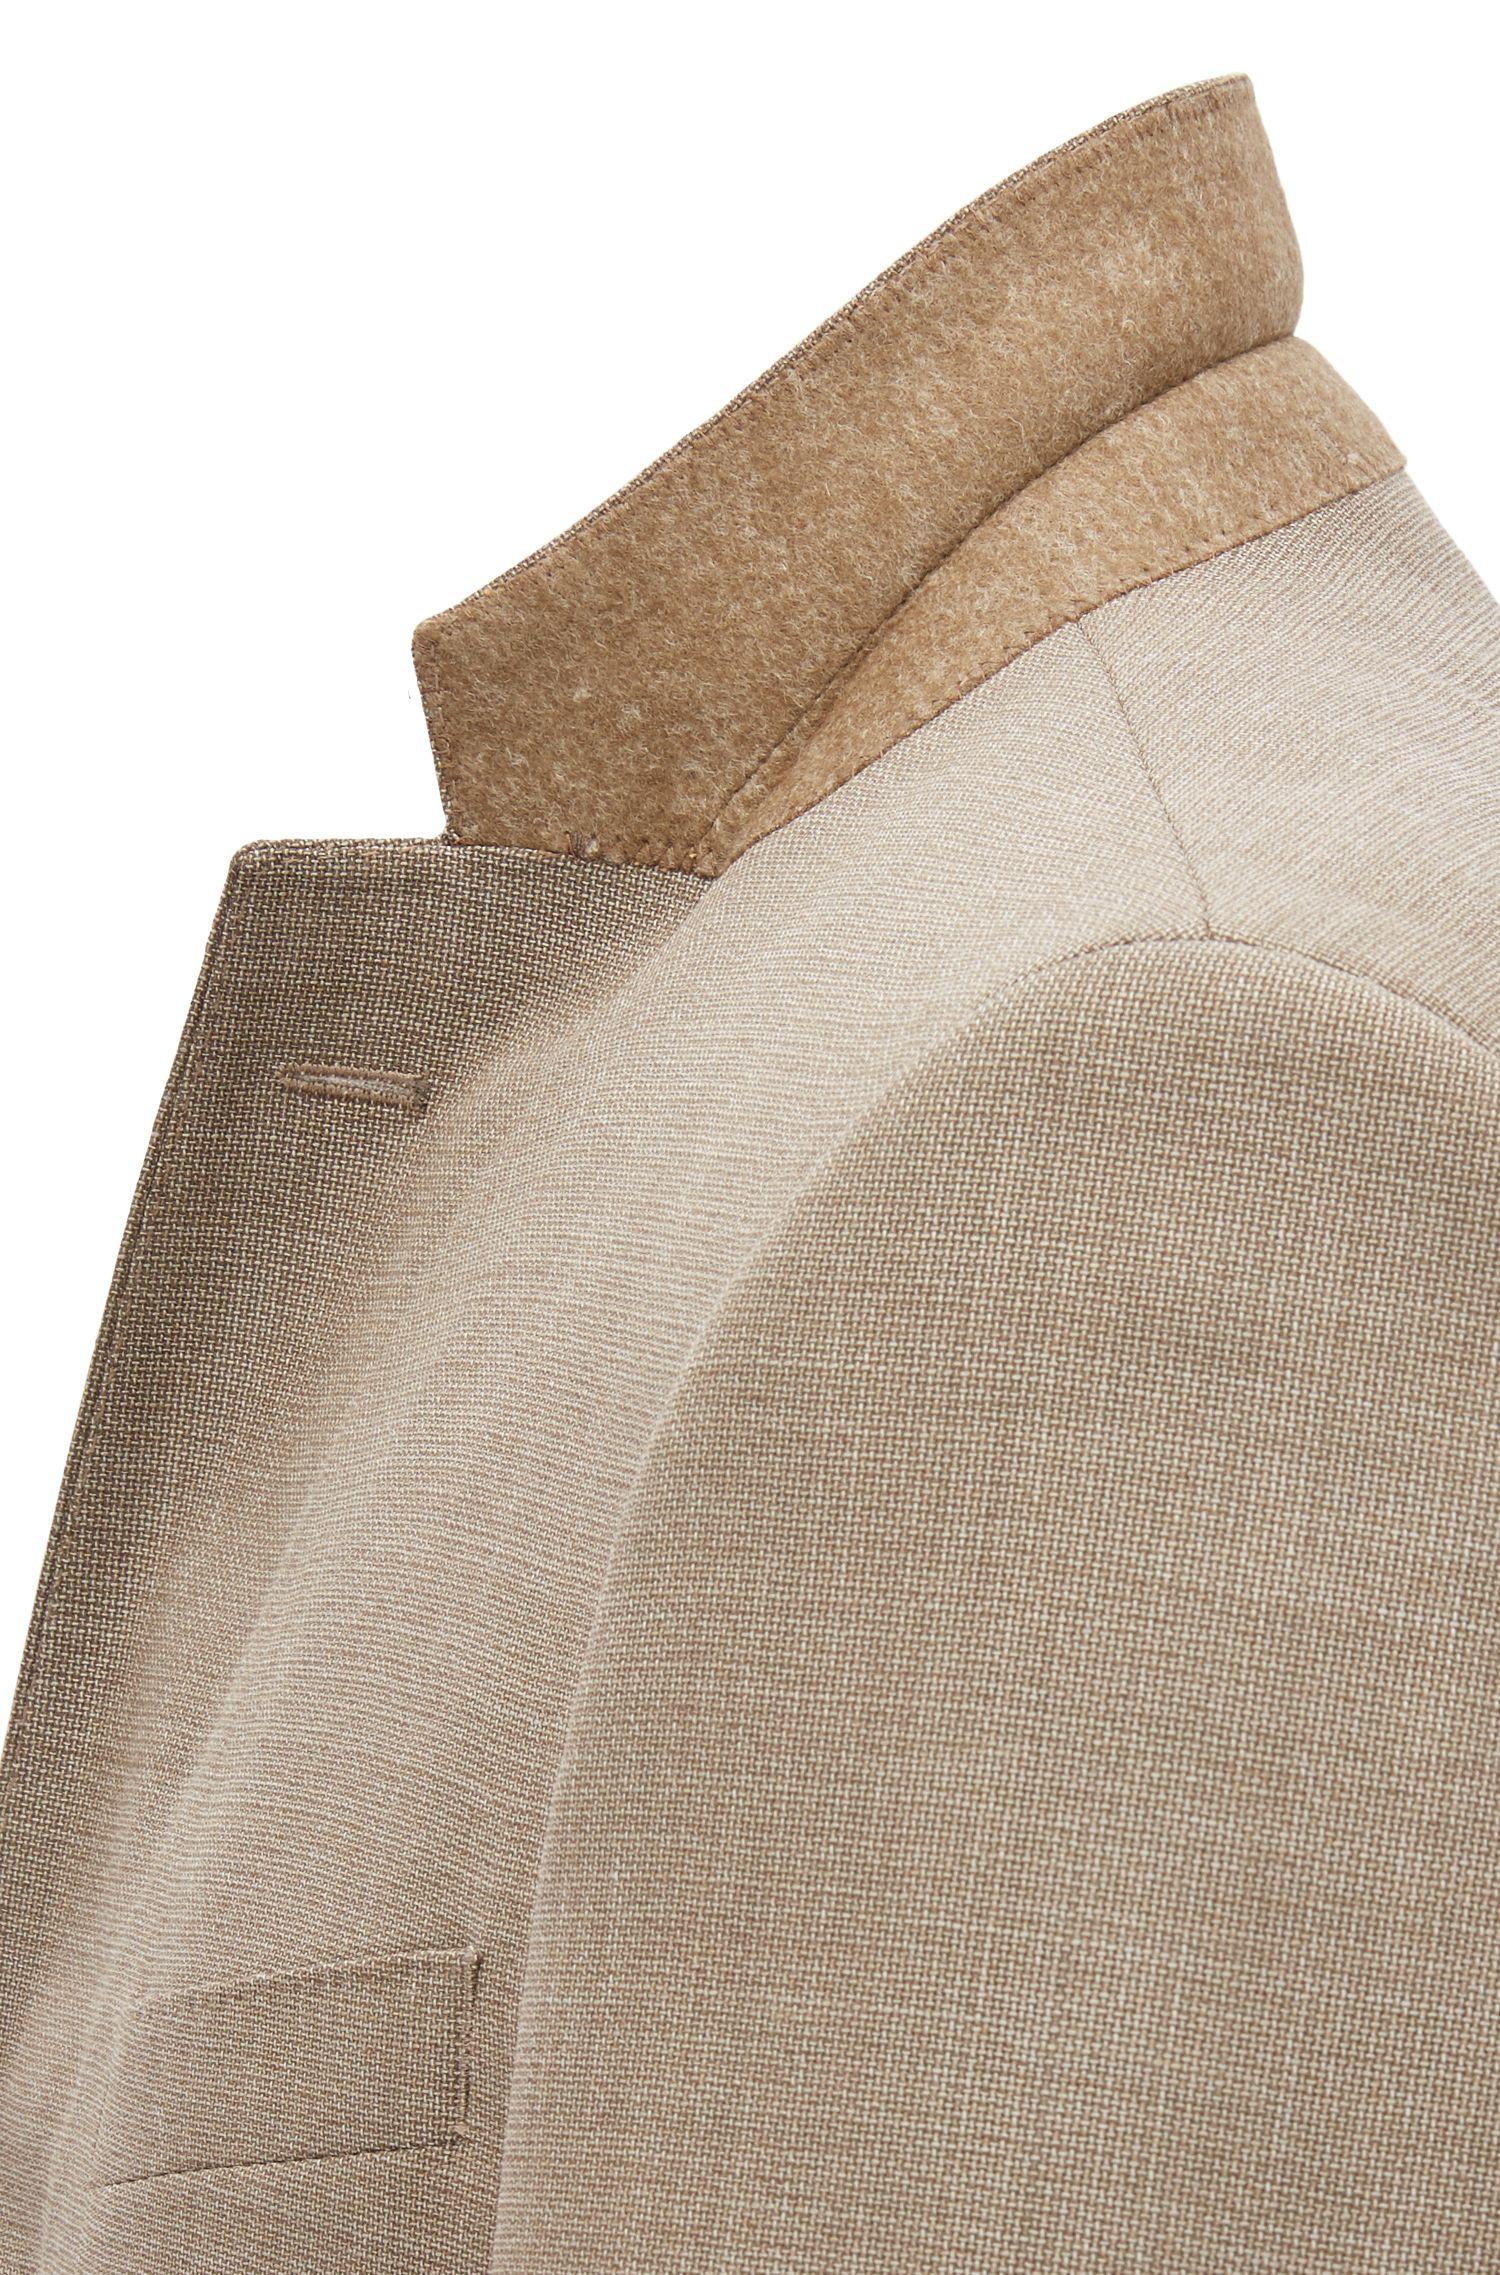 Traje slim fit en lana virgen con microestampado , Beige claro